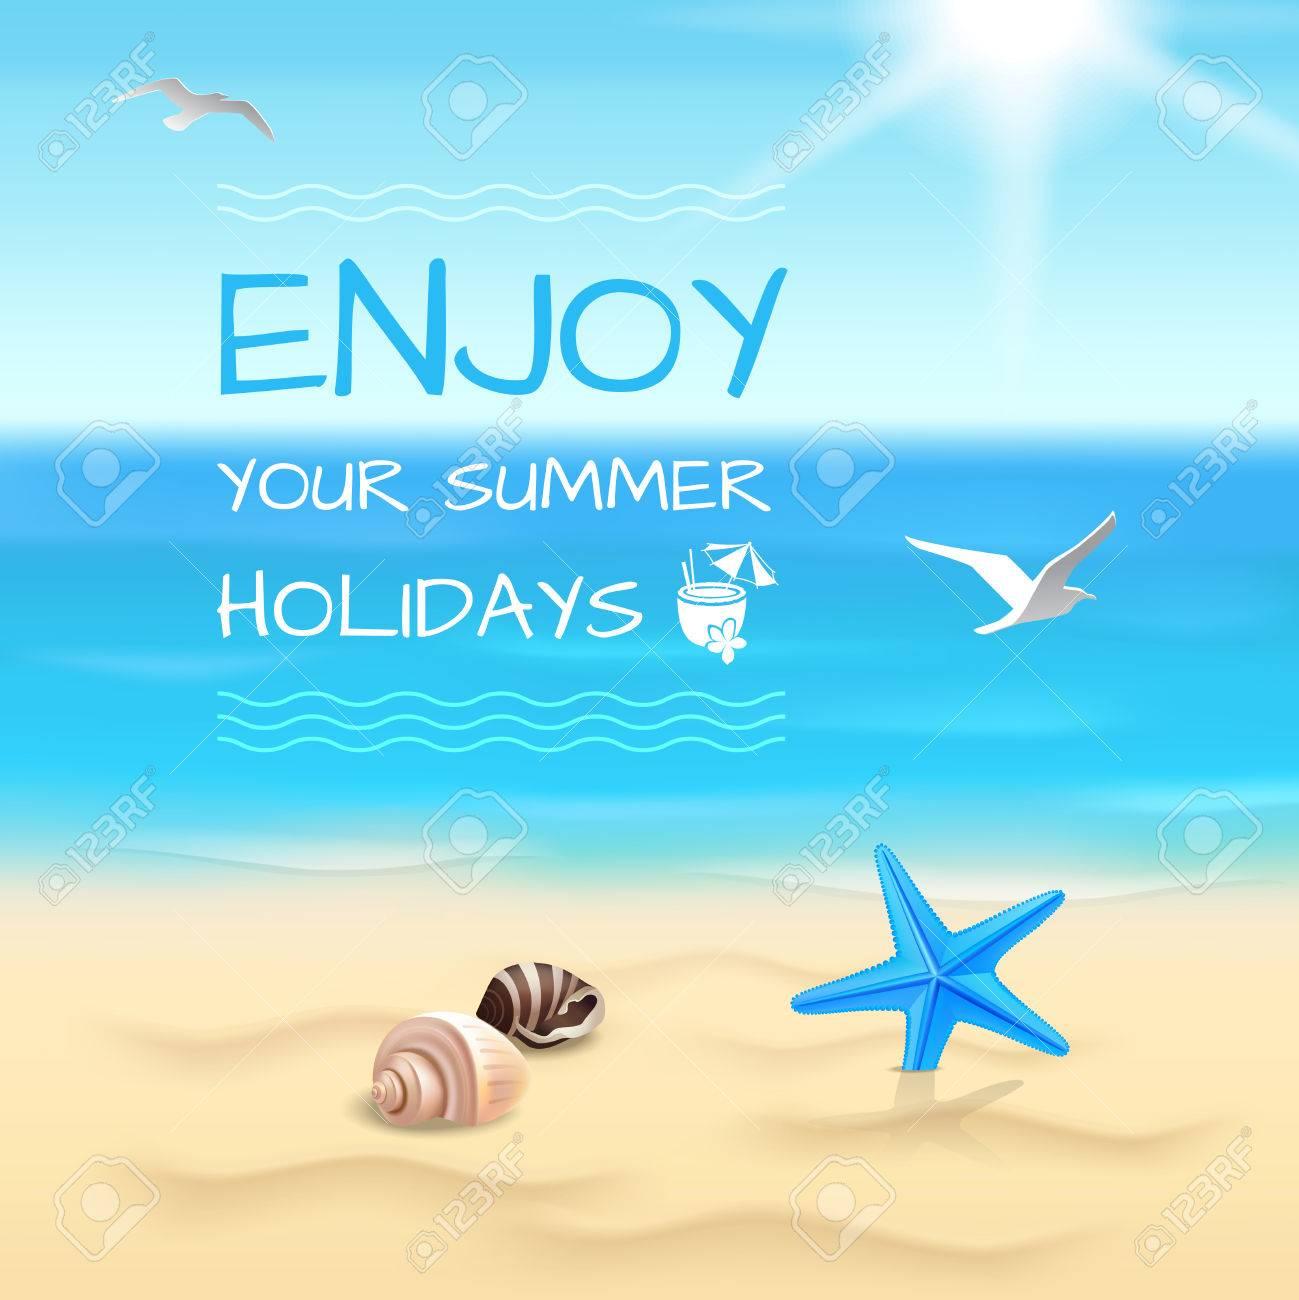 Summer Holidays Seaside Beach Background Enjoy Your Summer 1299x1300